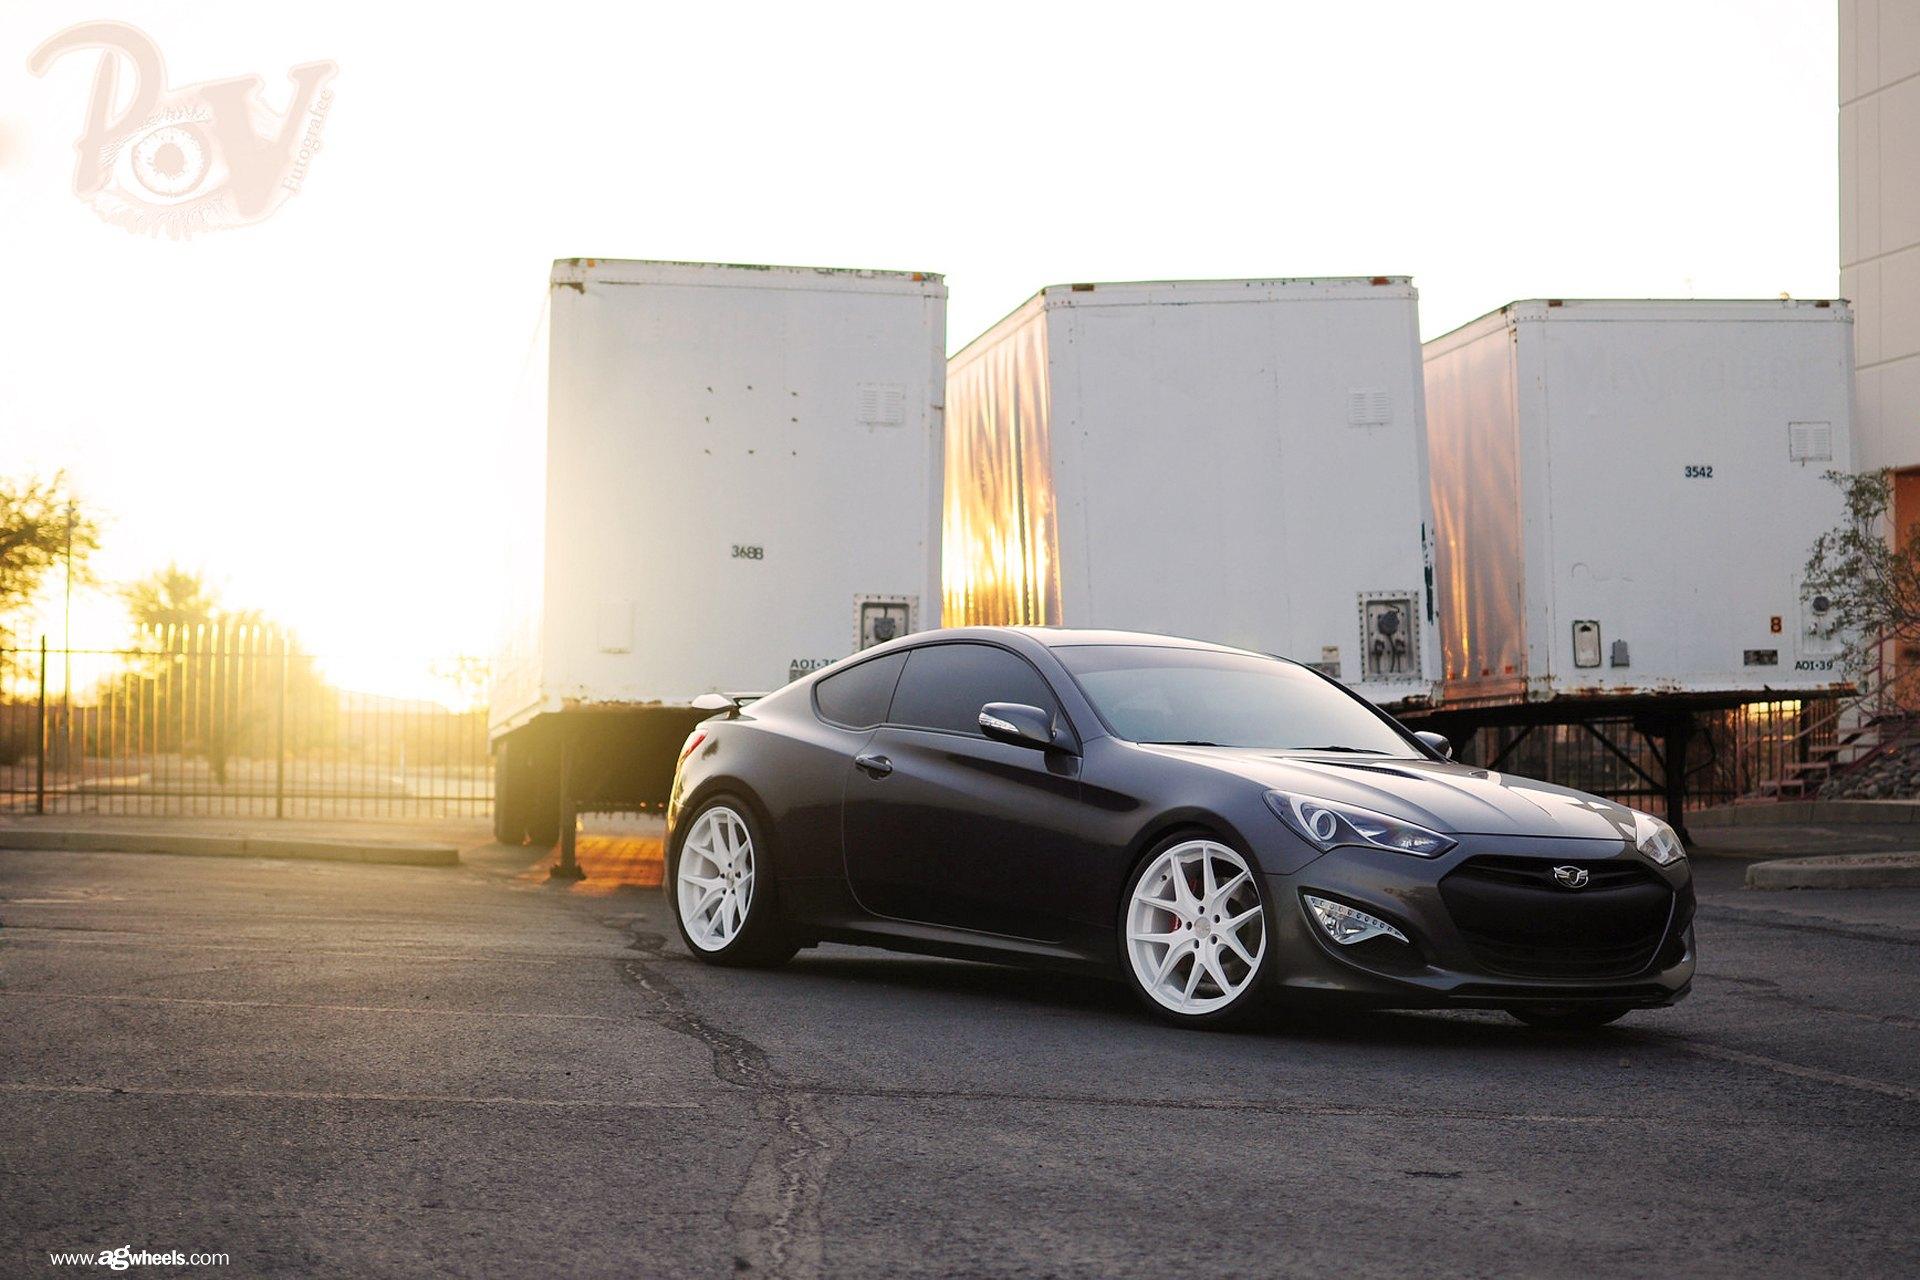 Custom Headlights On Black Hyundai Genesis Coupe Photo By Avant Garde Wheels